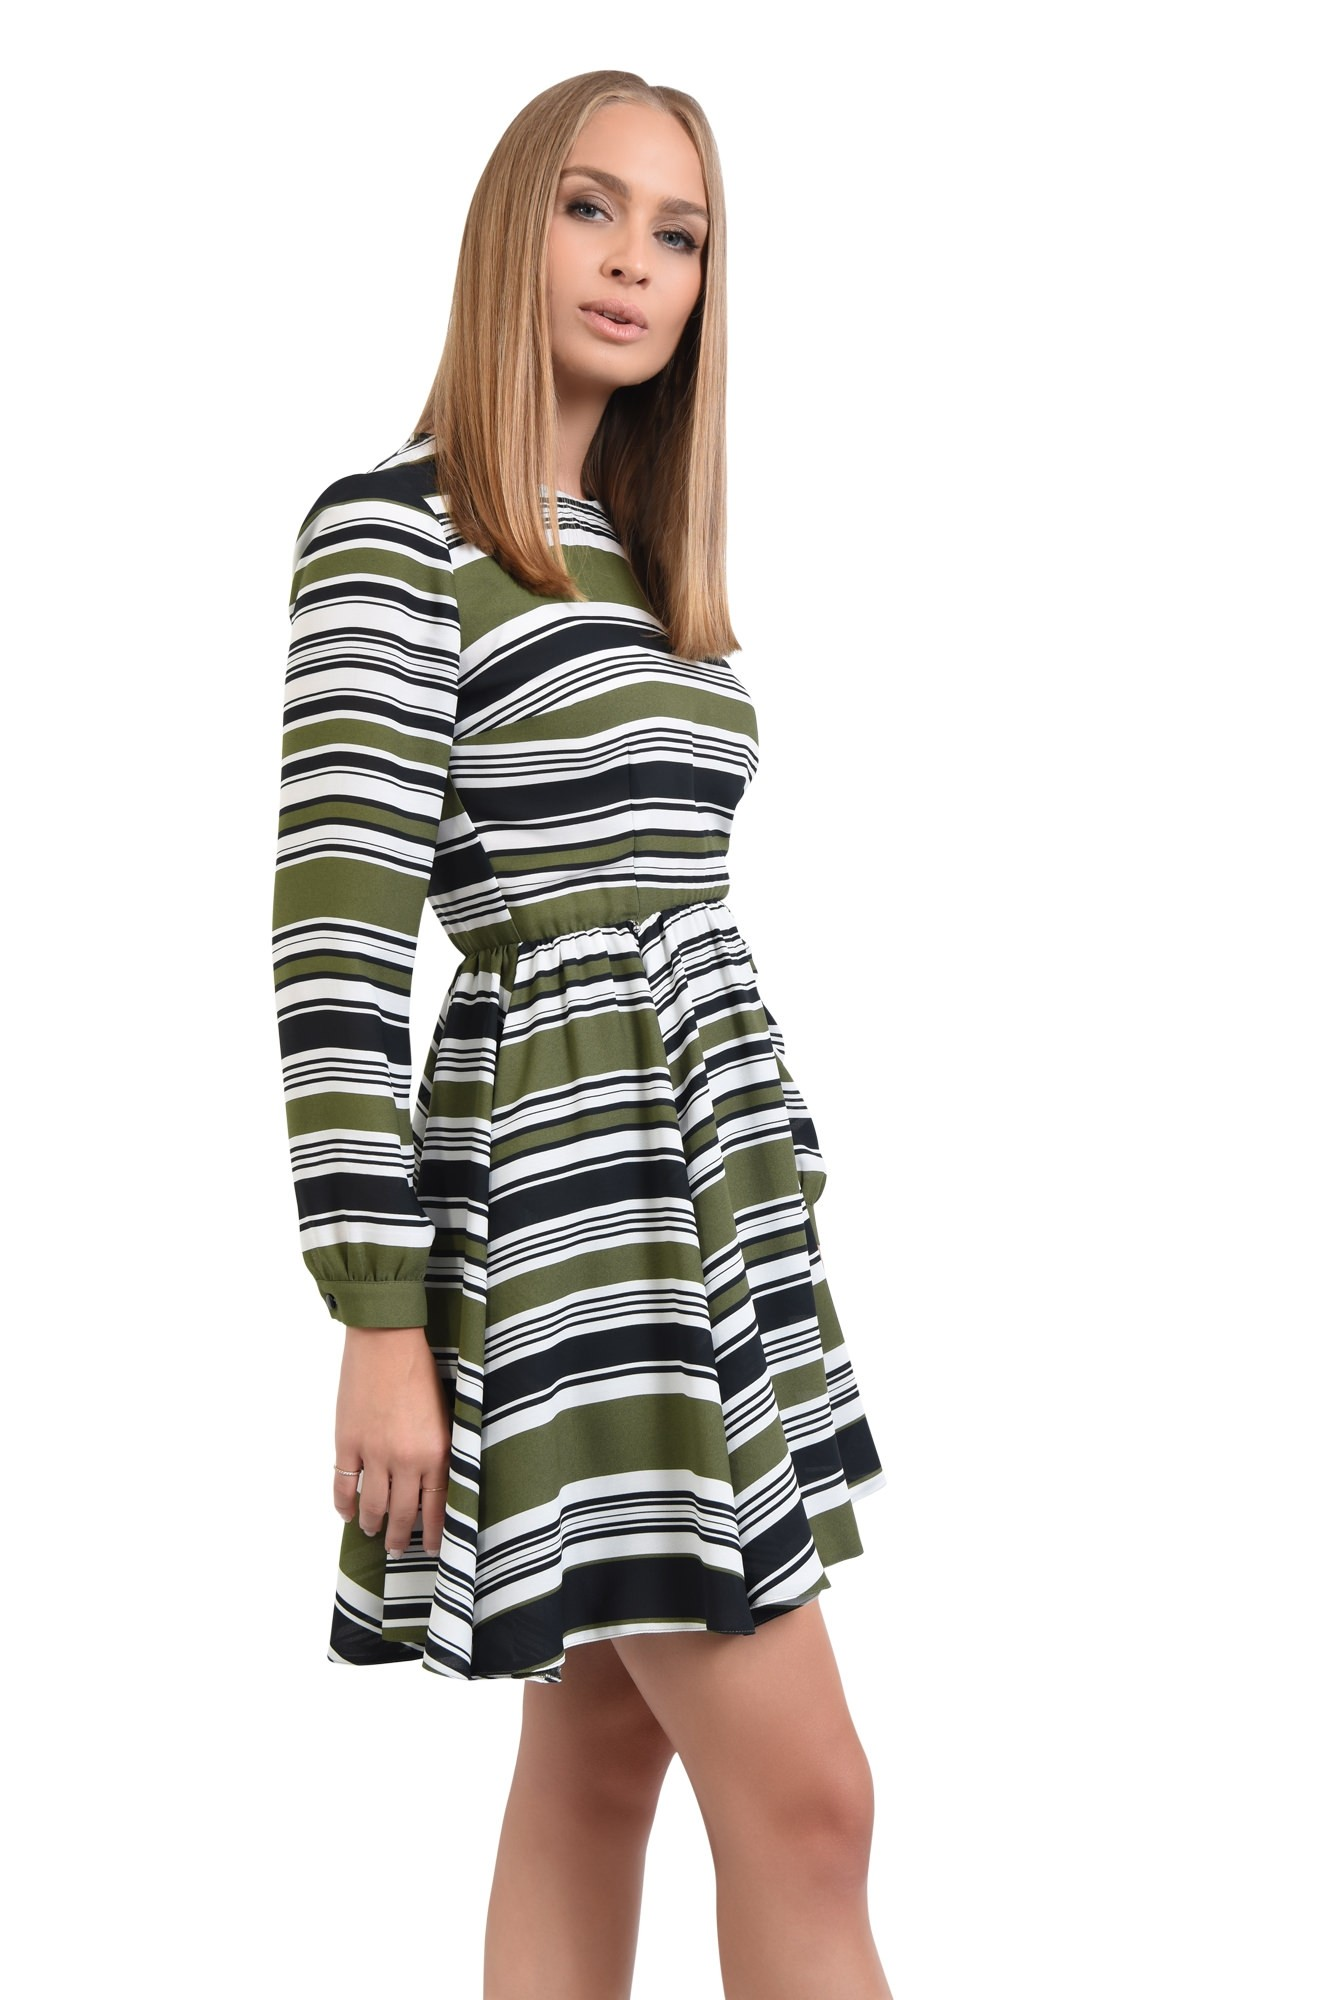 rochie casual, talie pe elastic, decolteu rotund la baza gatului, rochii online